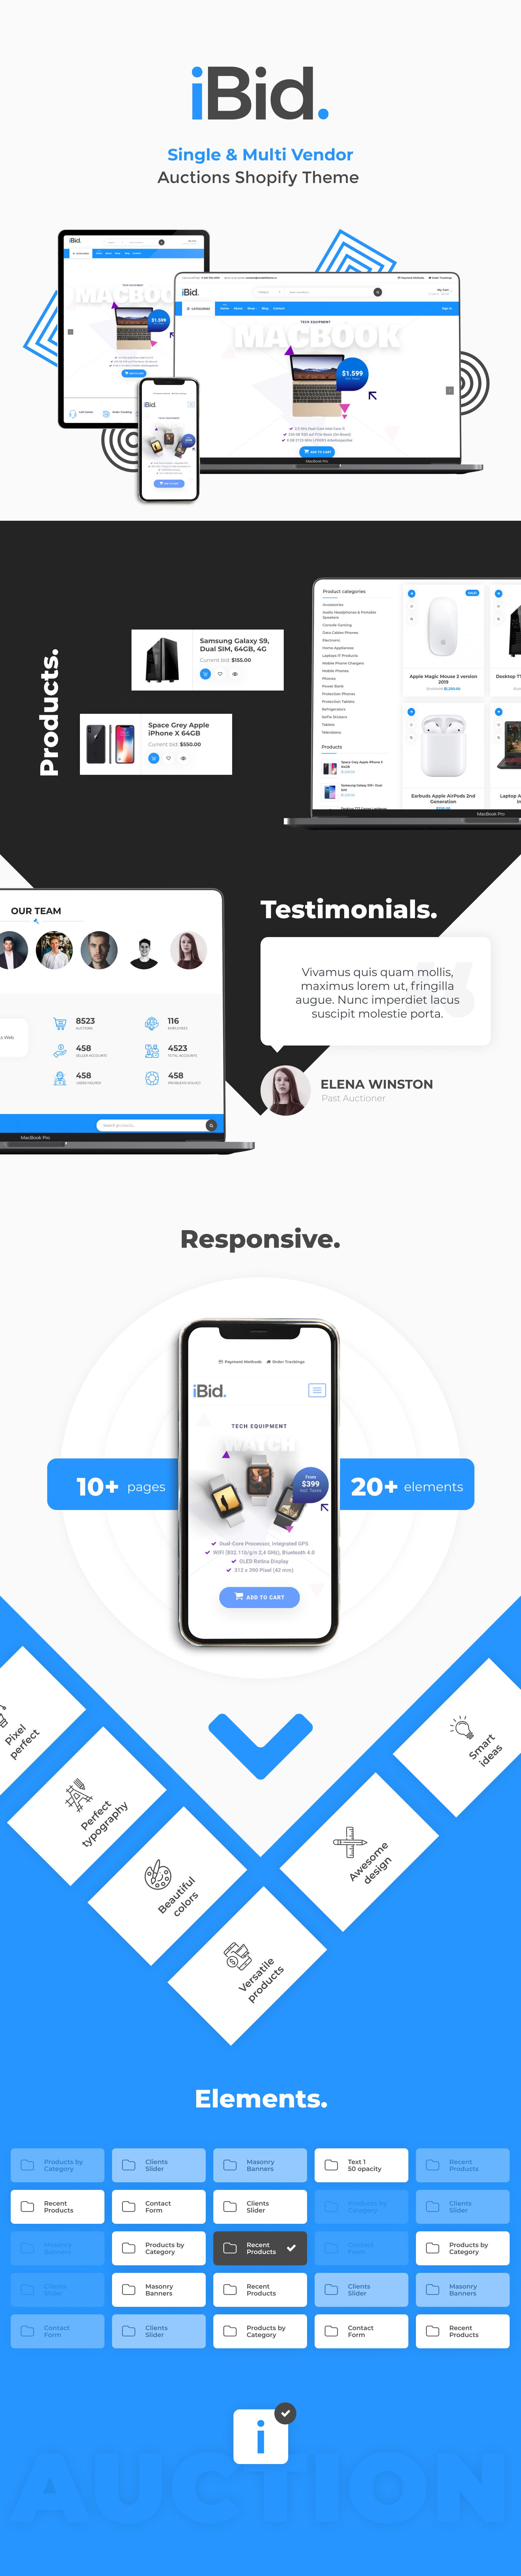 iBid - Single & Multi Vendor Auctions Shopify Theme - 3